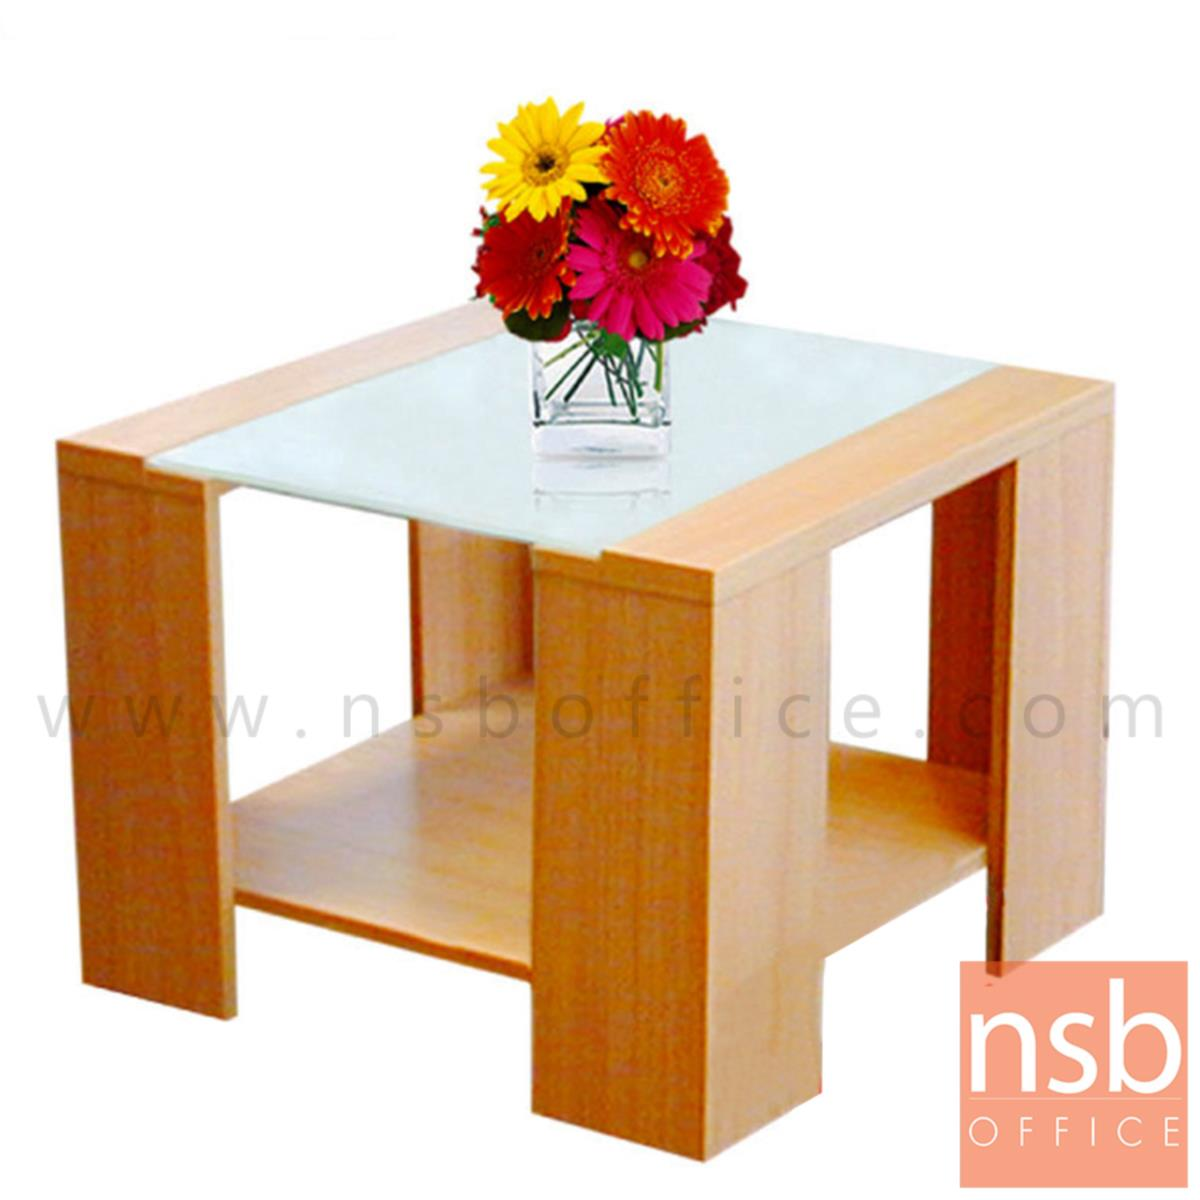 B13A061:โต๊ะกลางกระจก  รุ่น Grojband (กรอจแบนด์) ขนาด 60W cm. โครงไม้